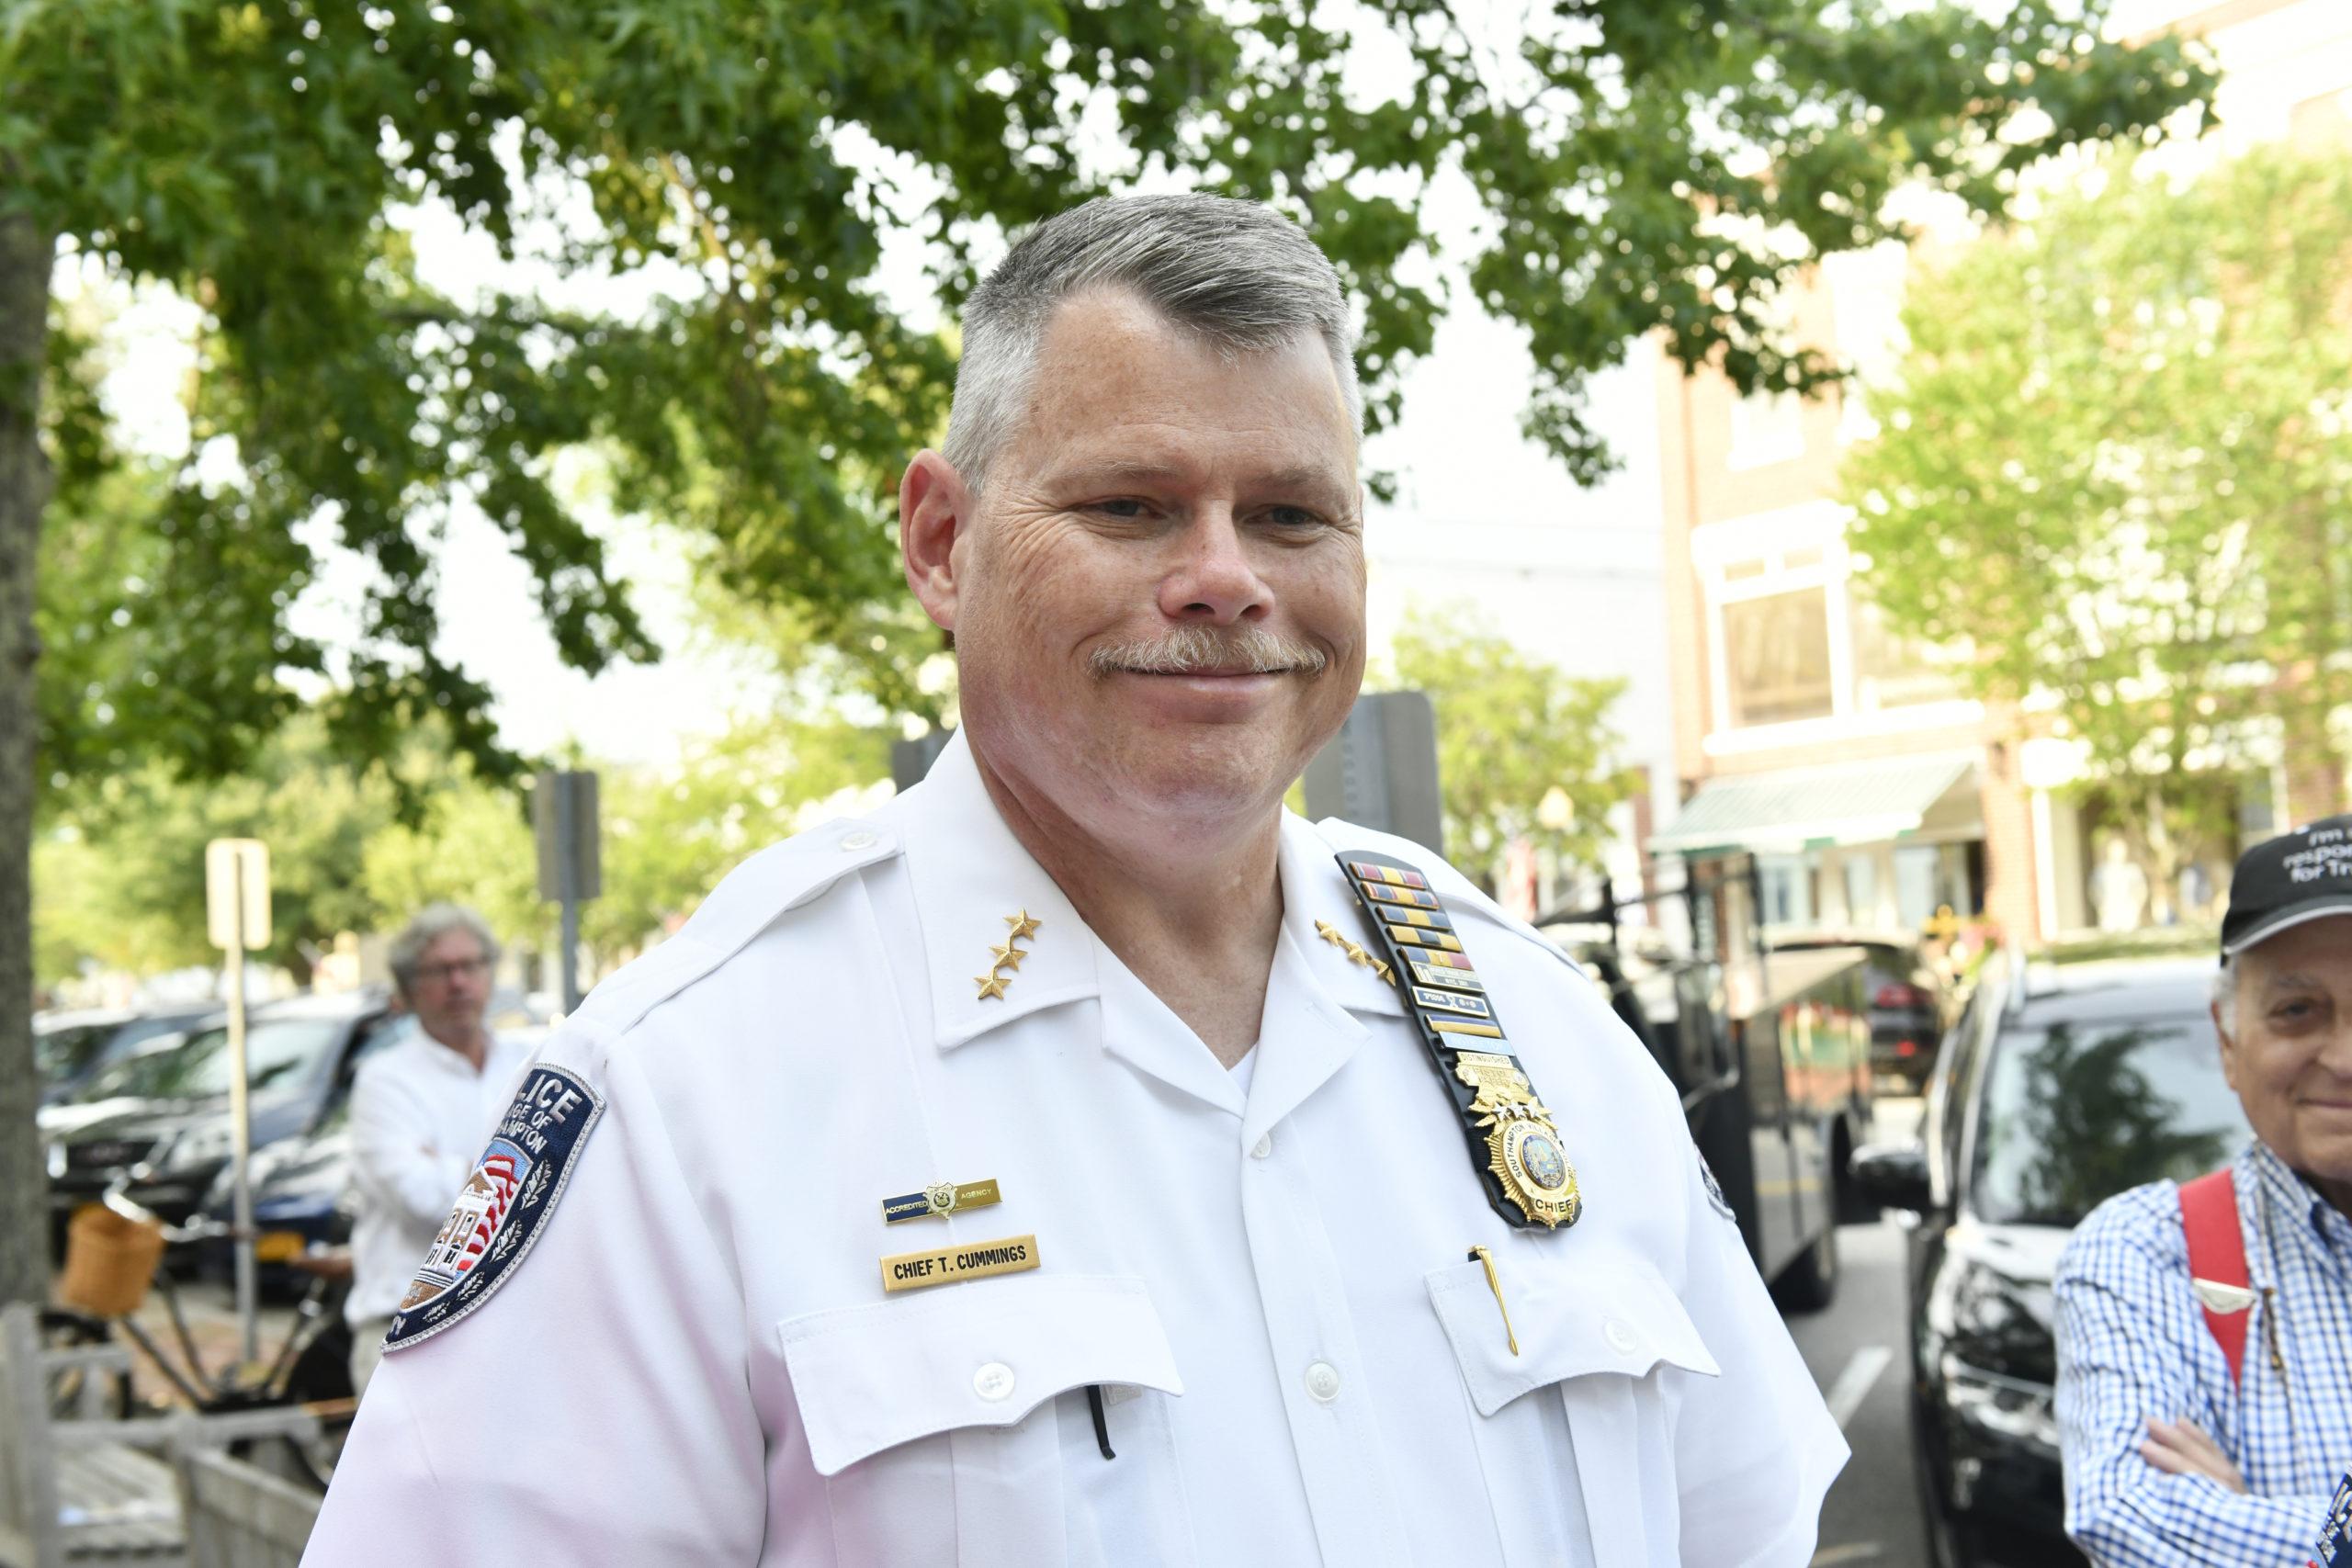 Southampton Village Police Chief Thomas Cummings is retiring.